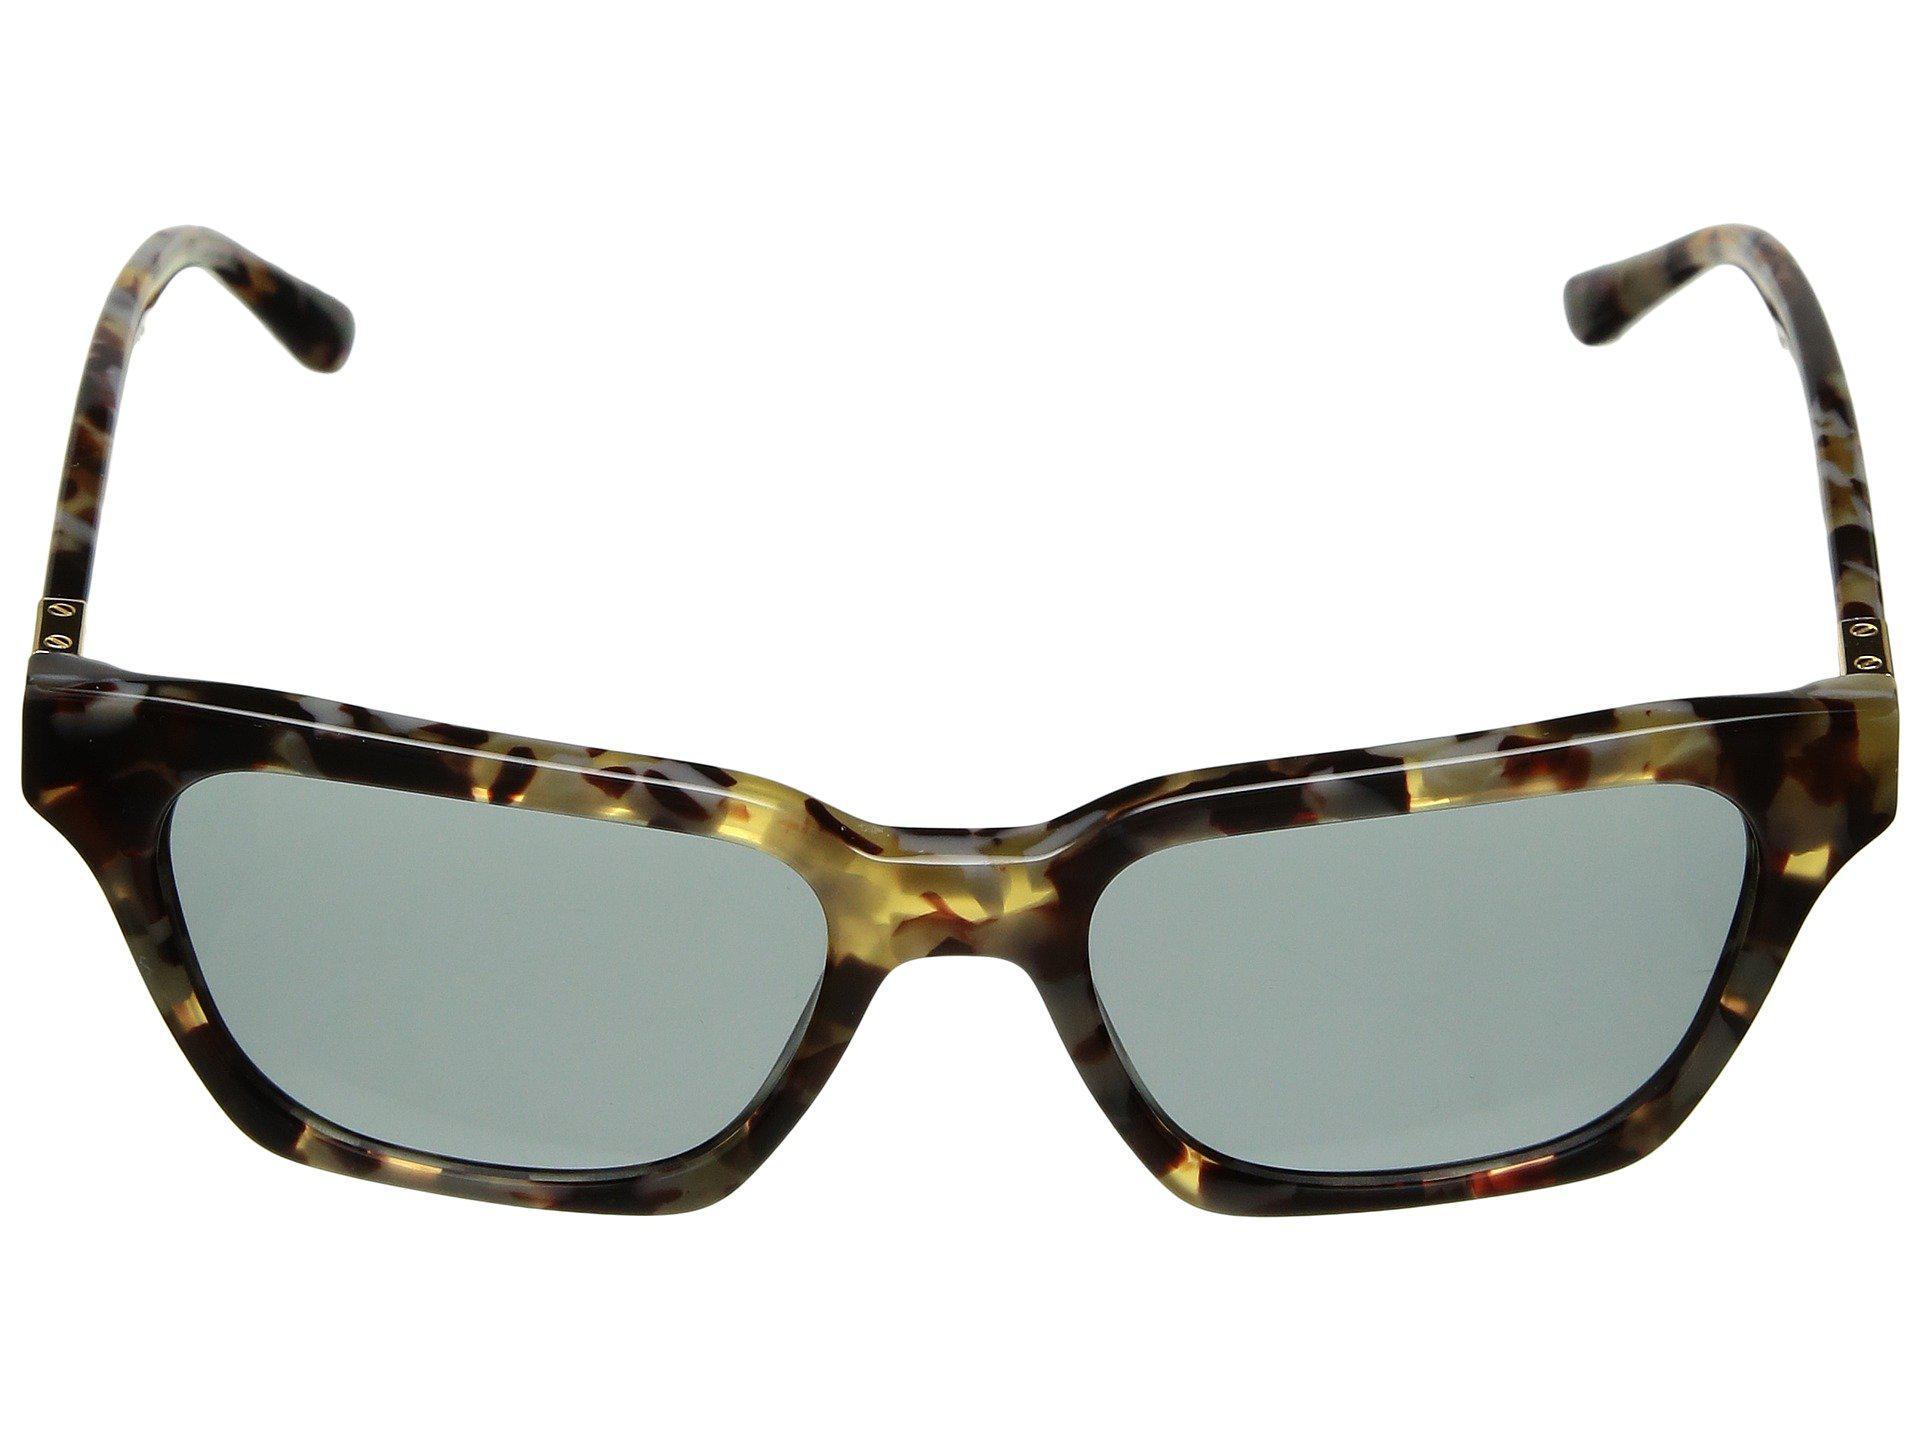 4647dc7599 Lyst - Tory Burch 0ty7119 51mm (blush Tortoise solid Brown) Fashion ...